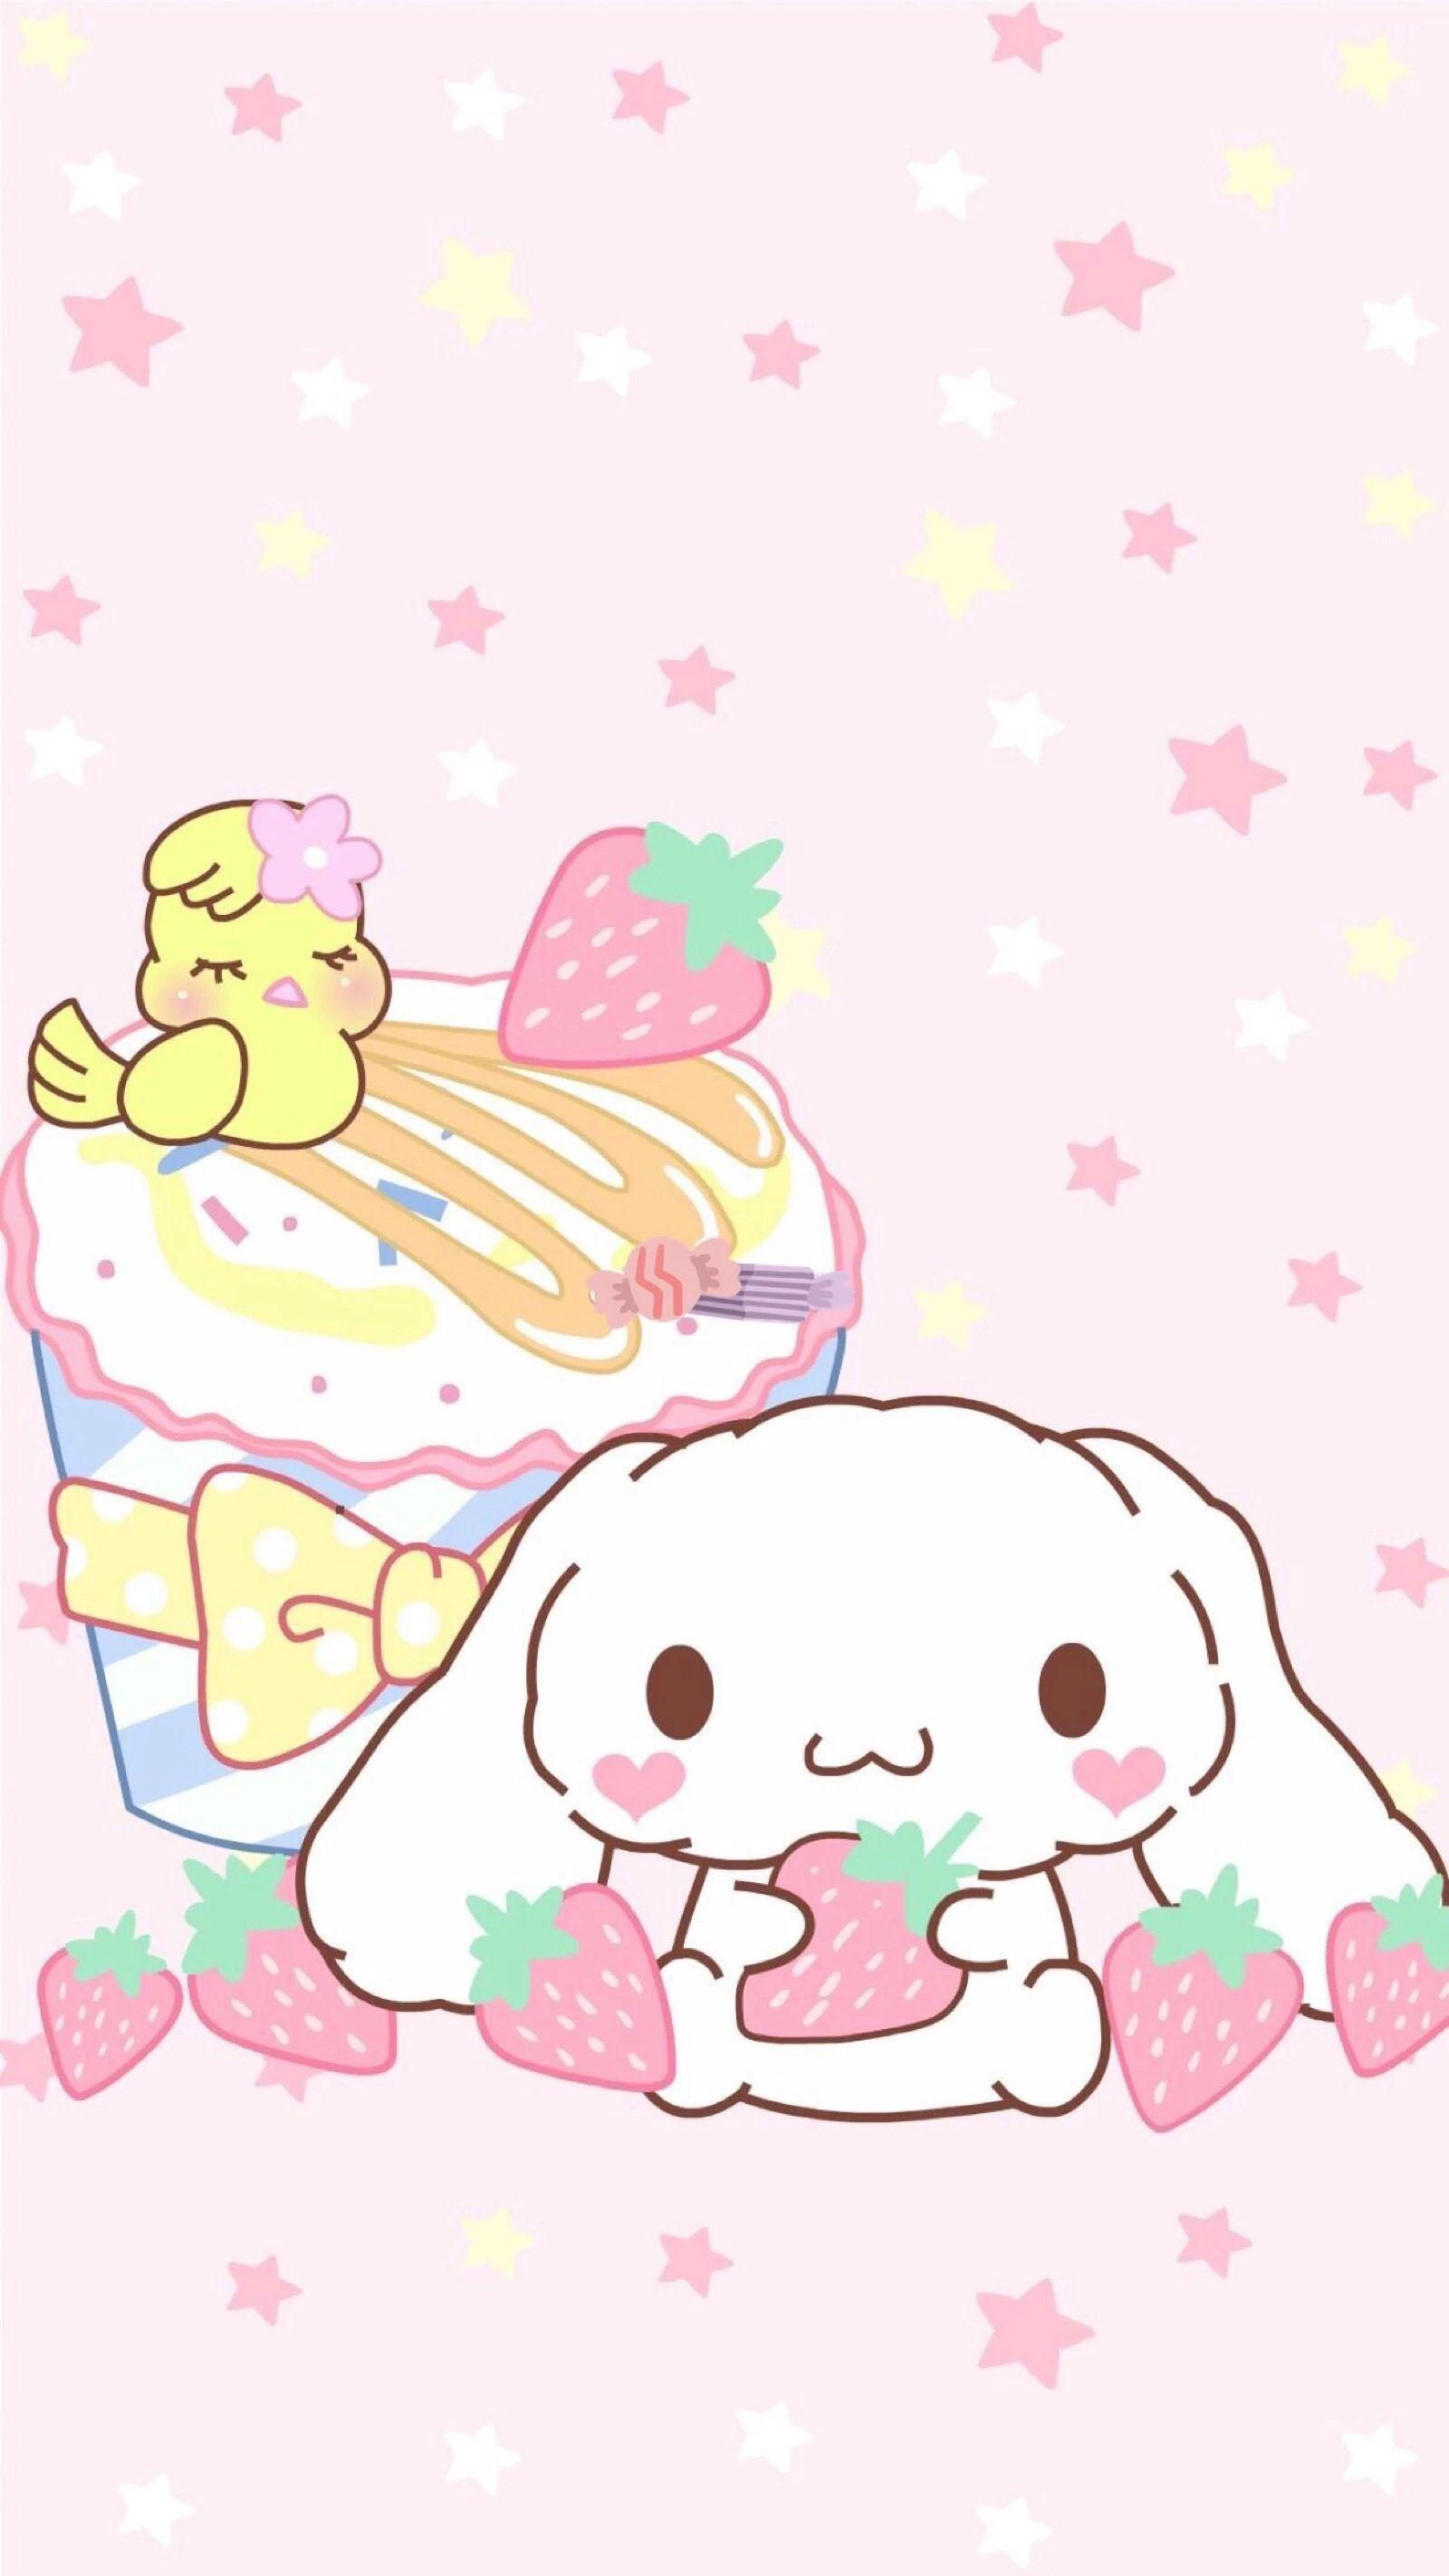 Cute Strawberry Kawaii Wallpaper Cute Wallpapers Hello Kitty Wallpaper